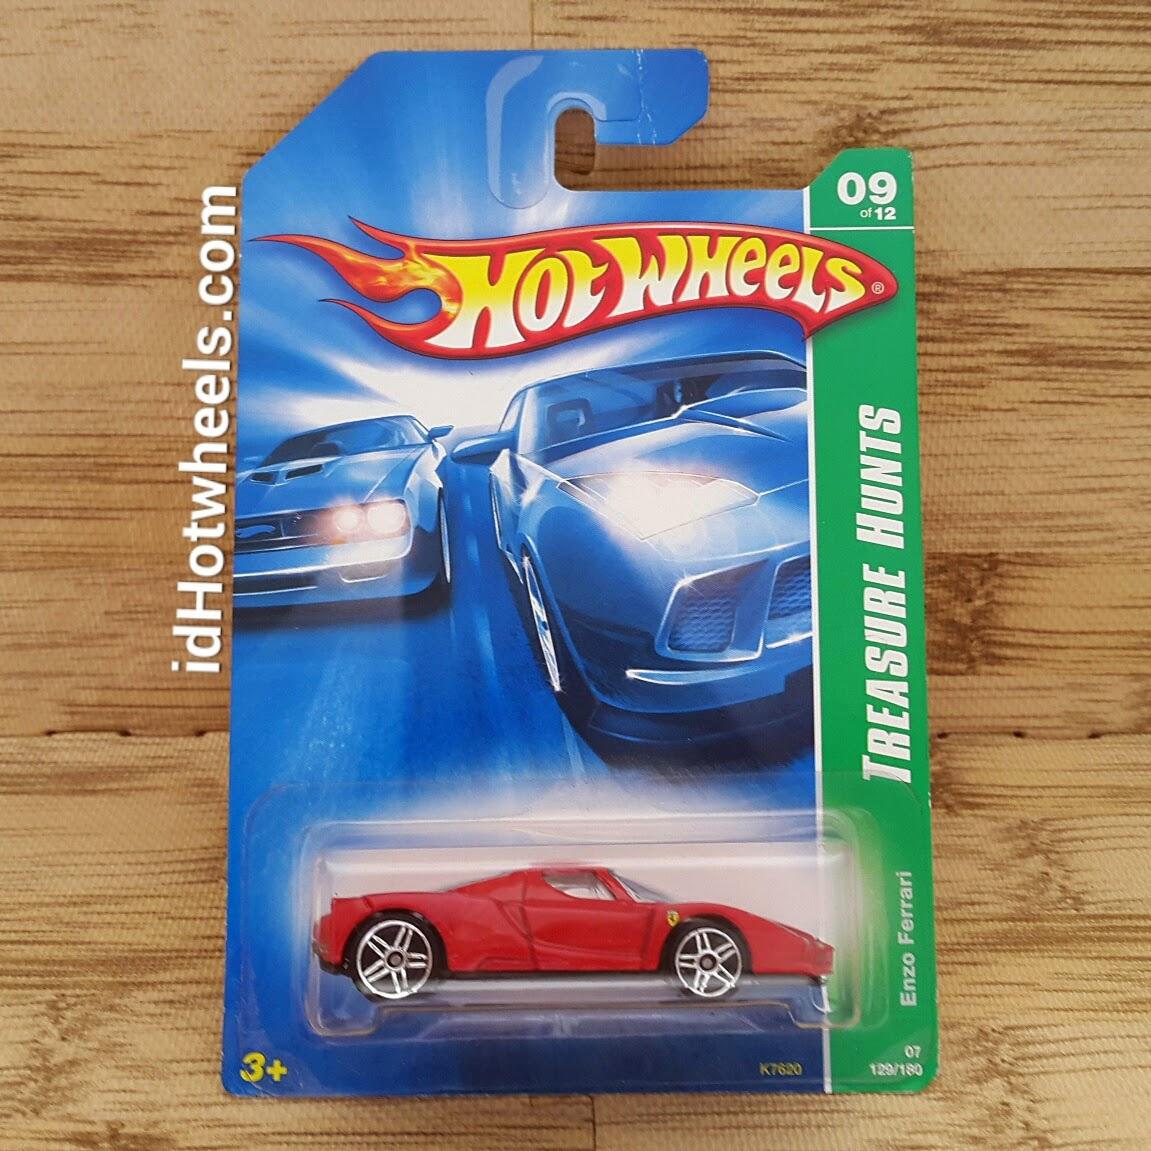 Hot Wheels Ferrari Skala 164 Paket 7 Pcs Dijual Indohotwheels Hotwheels Volkswagen Baja Bug White Tropicool Series 2007 Enzo Red Treasure Hunts 09 Of 12 Long Card